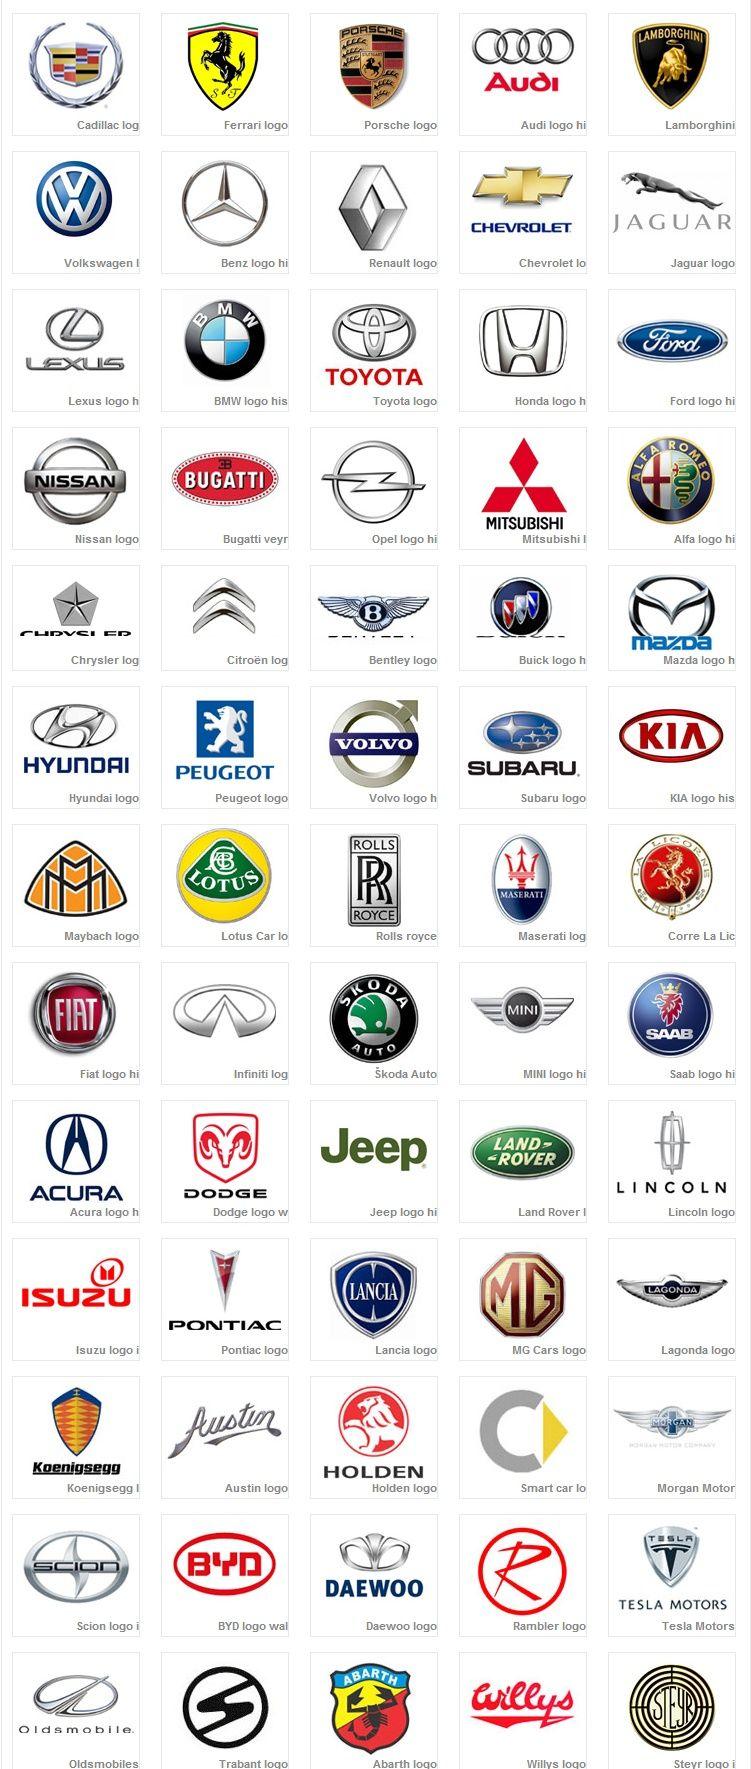 car logo Car brands logos, Car symbols, Sports cars ferrari